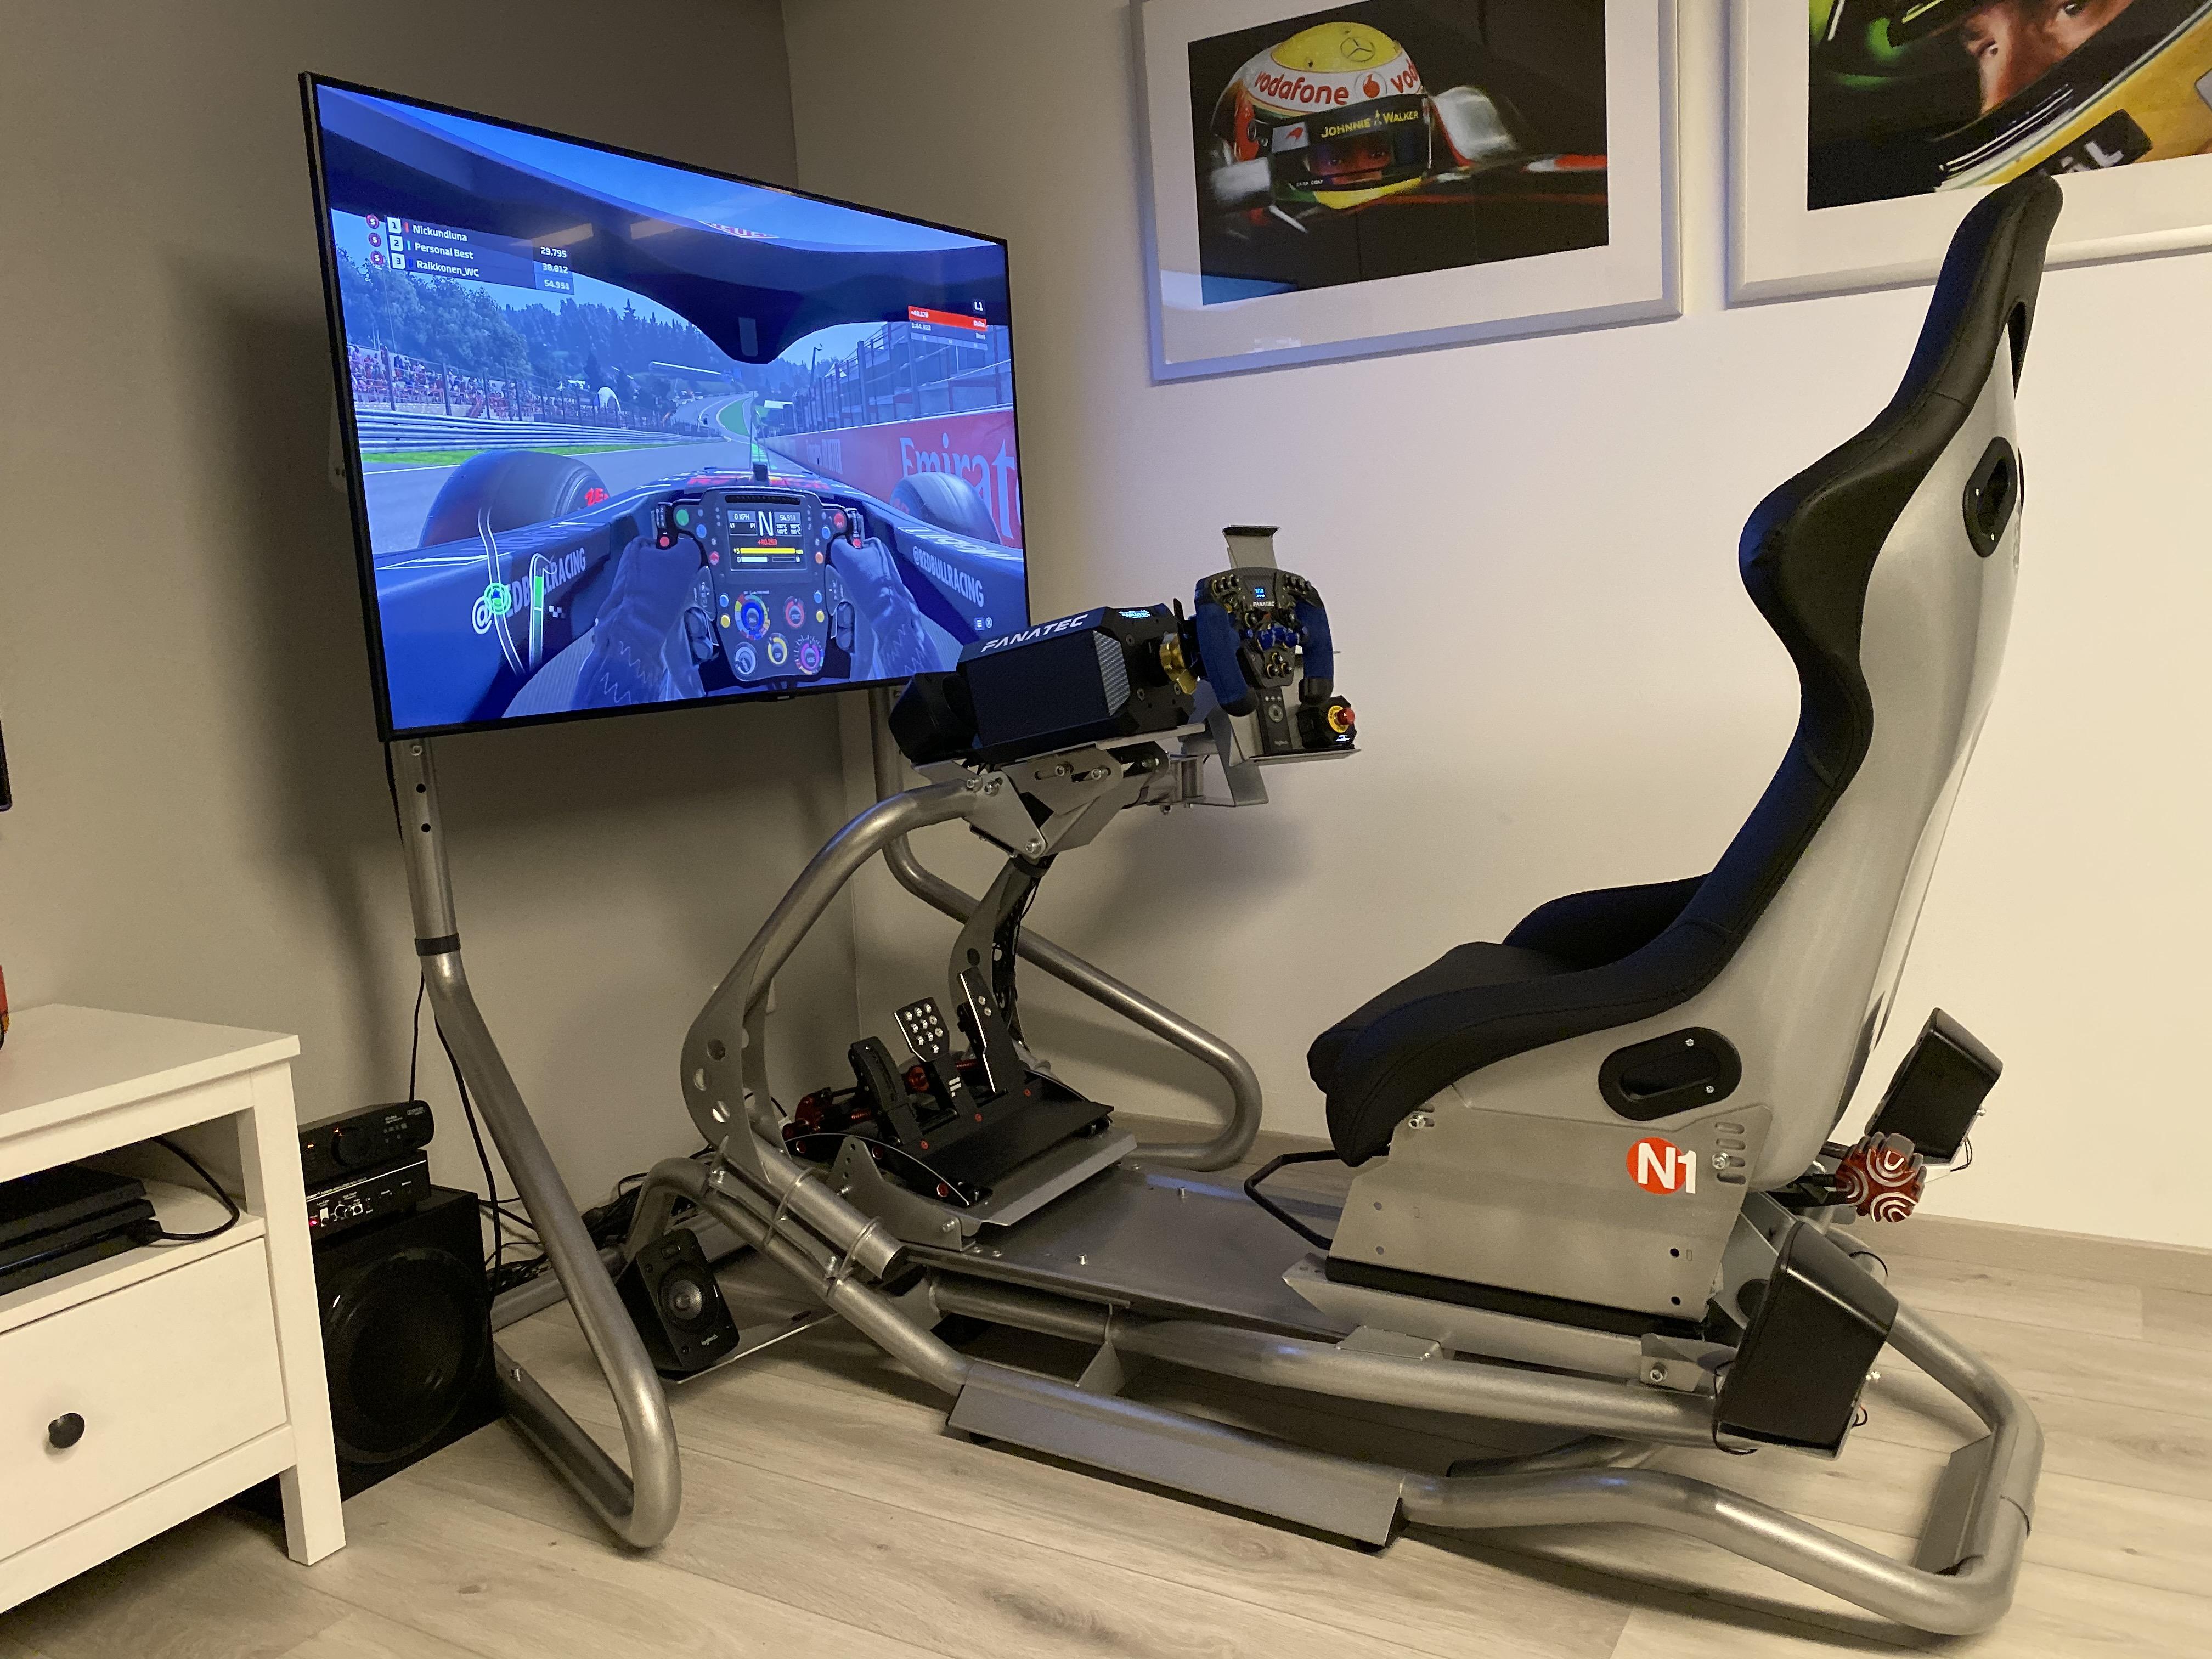 https://raymondsmits.nl/documenten/Race-Simulator07.jpg